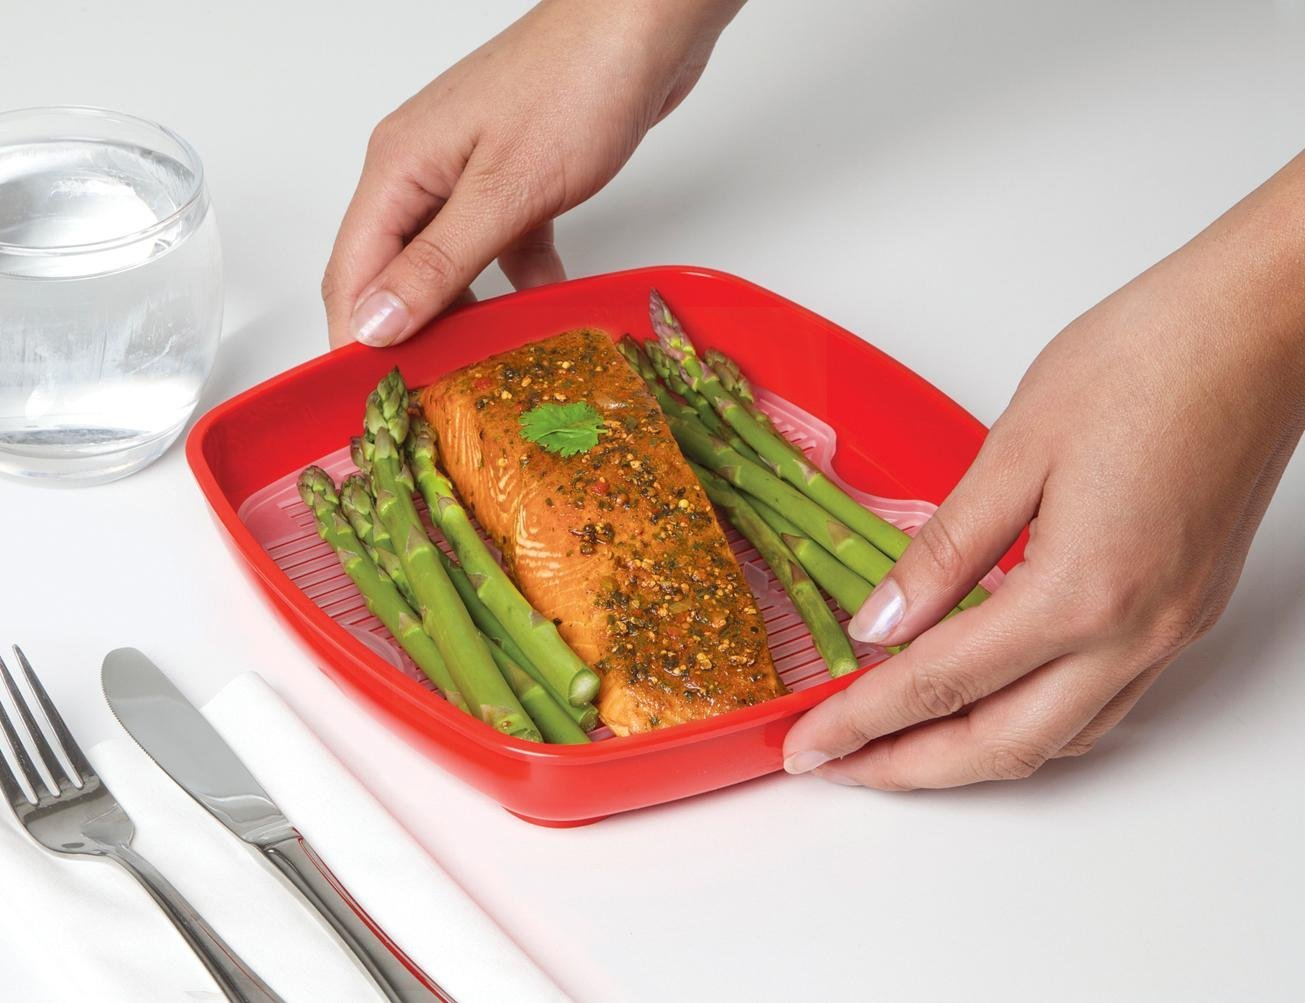 Microwave Steamer; Sistema; Microwave Plate